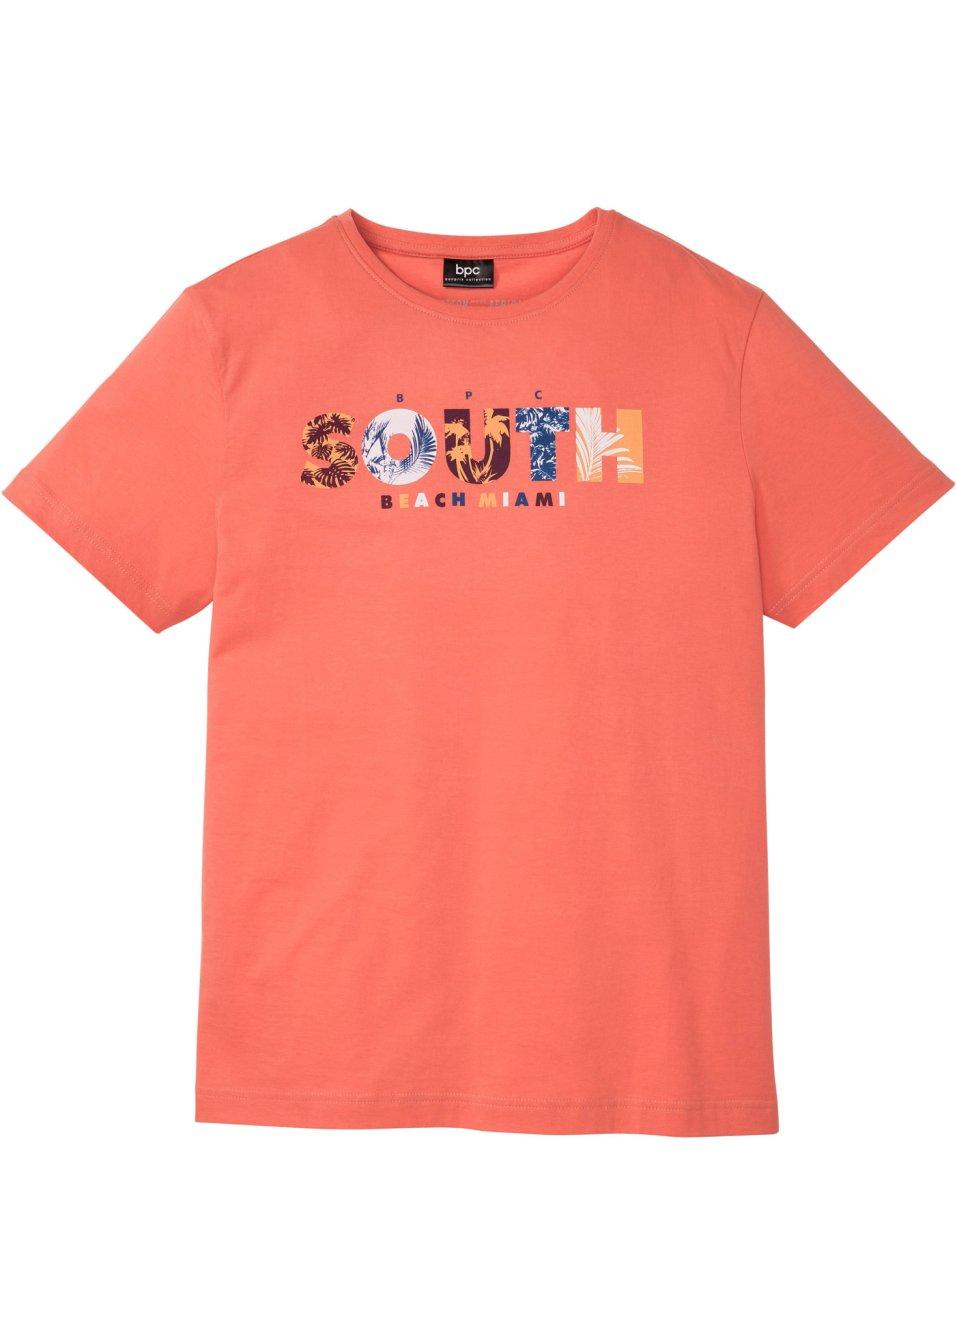 Modisches Herren T-Shirt mit Print - mandarine bedruckt Ra6wK wiEqs